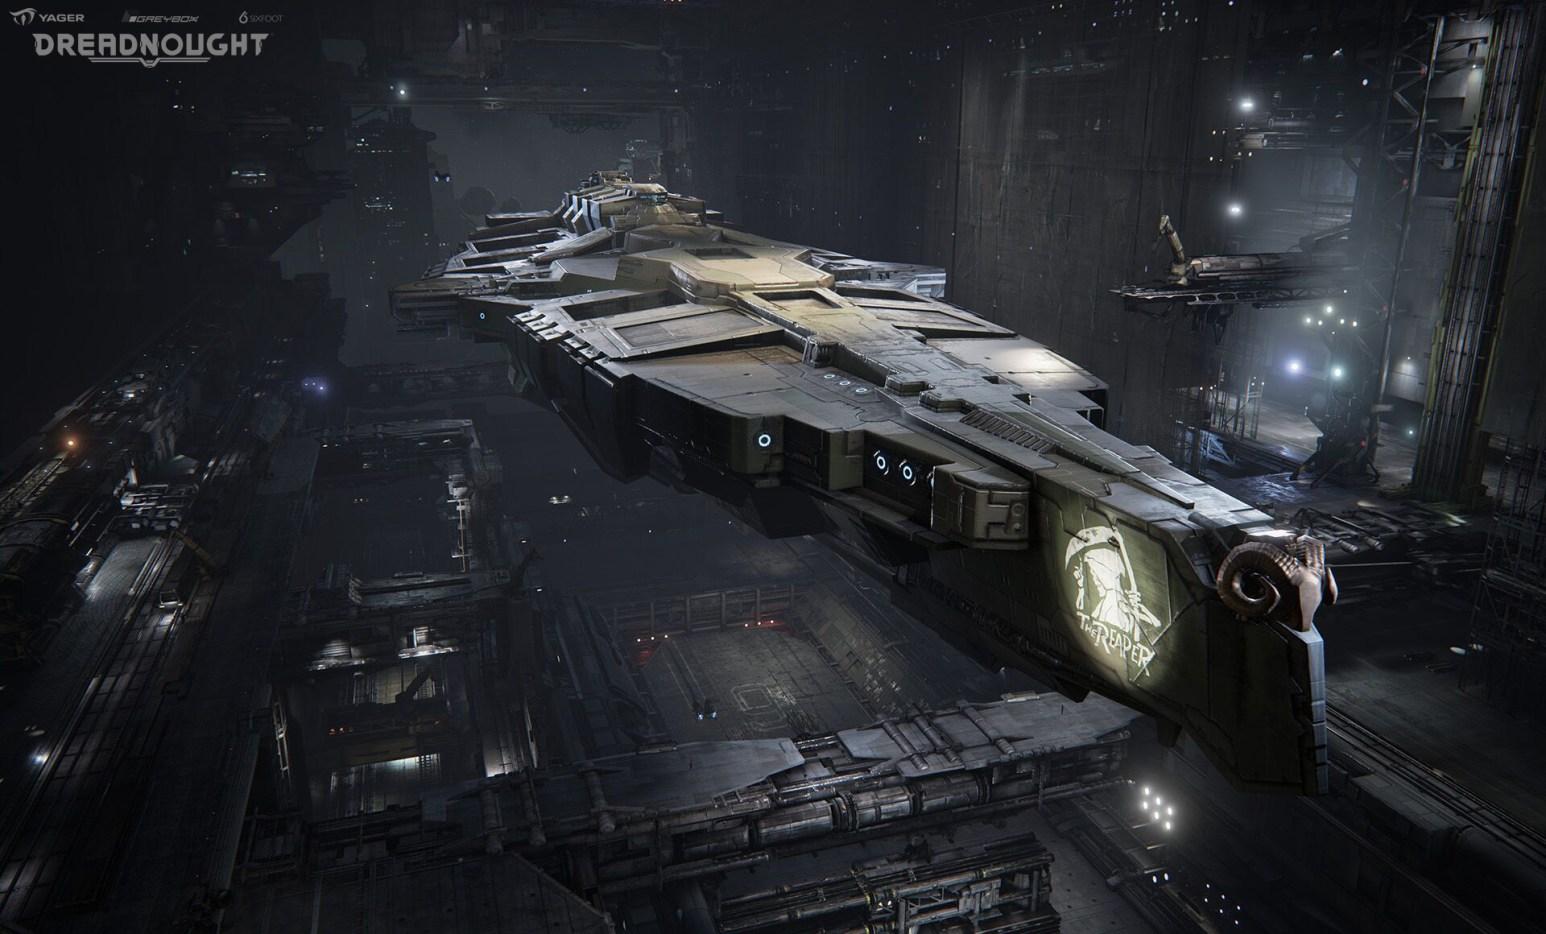 Dreadnought In Hanger